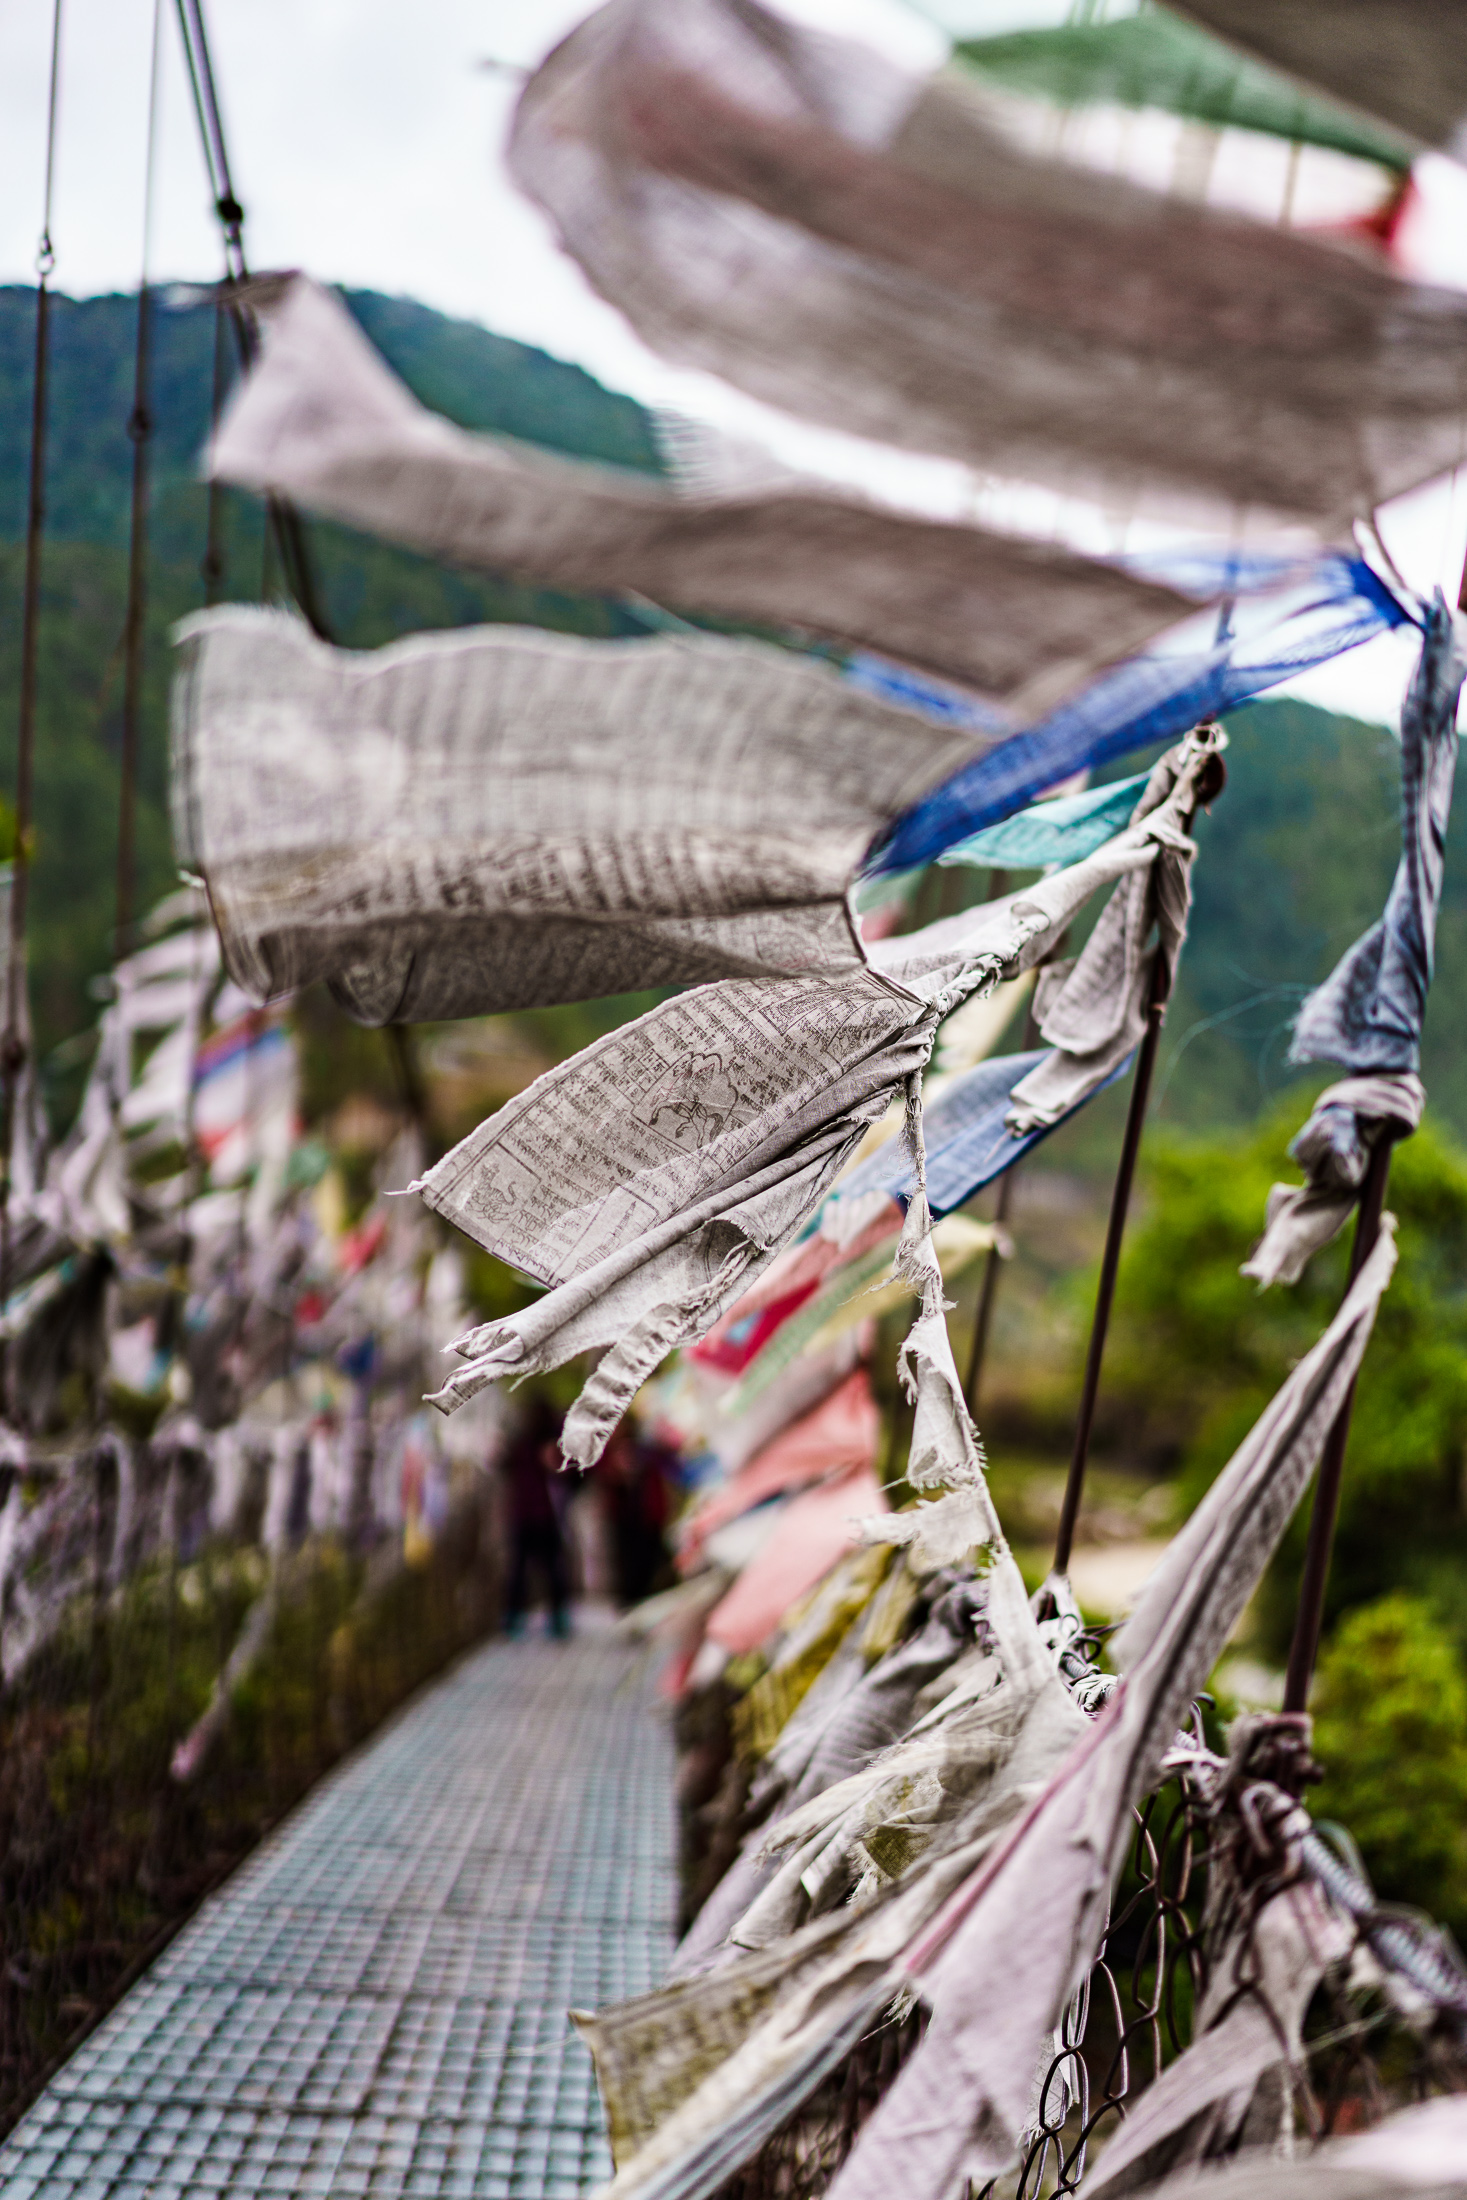 2019.04.07_LHO Bhutan_8547_2200px.jpg